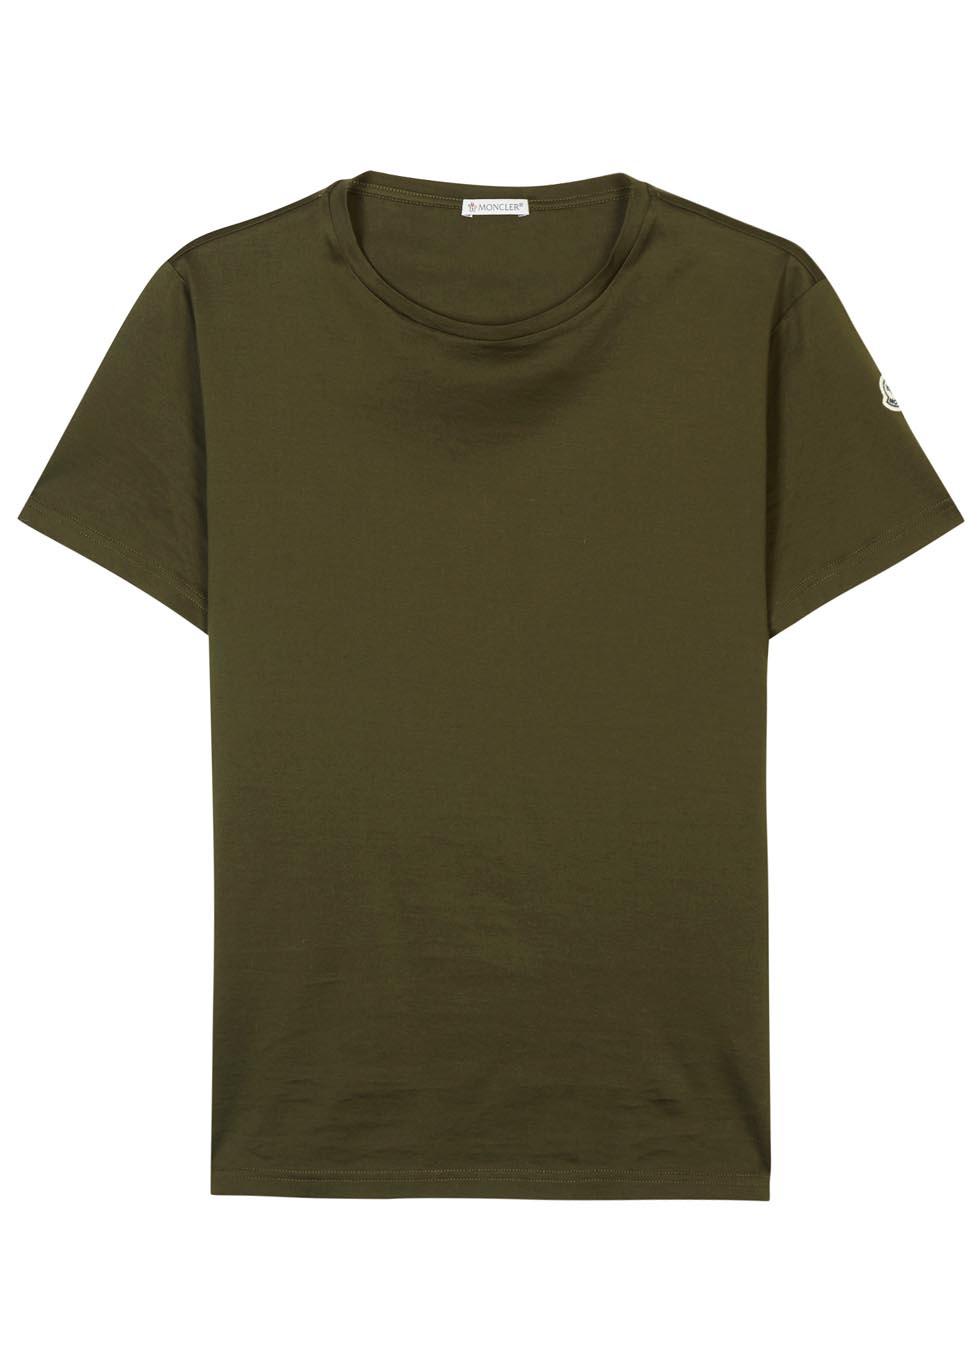 khaki green moncler t shirt